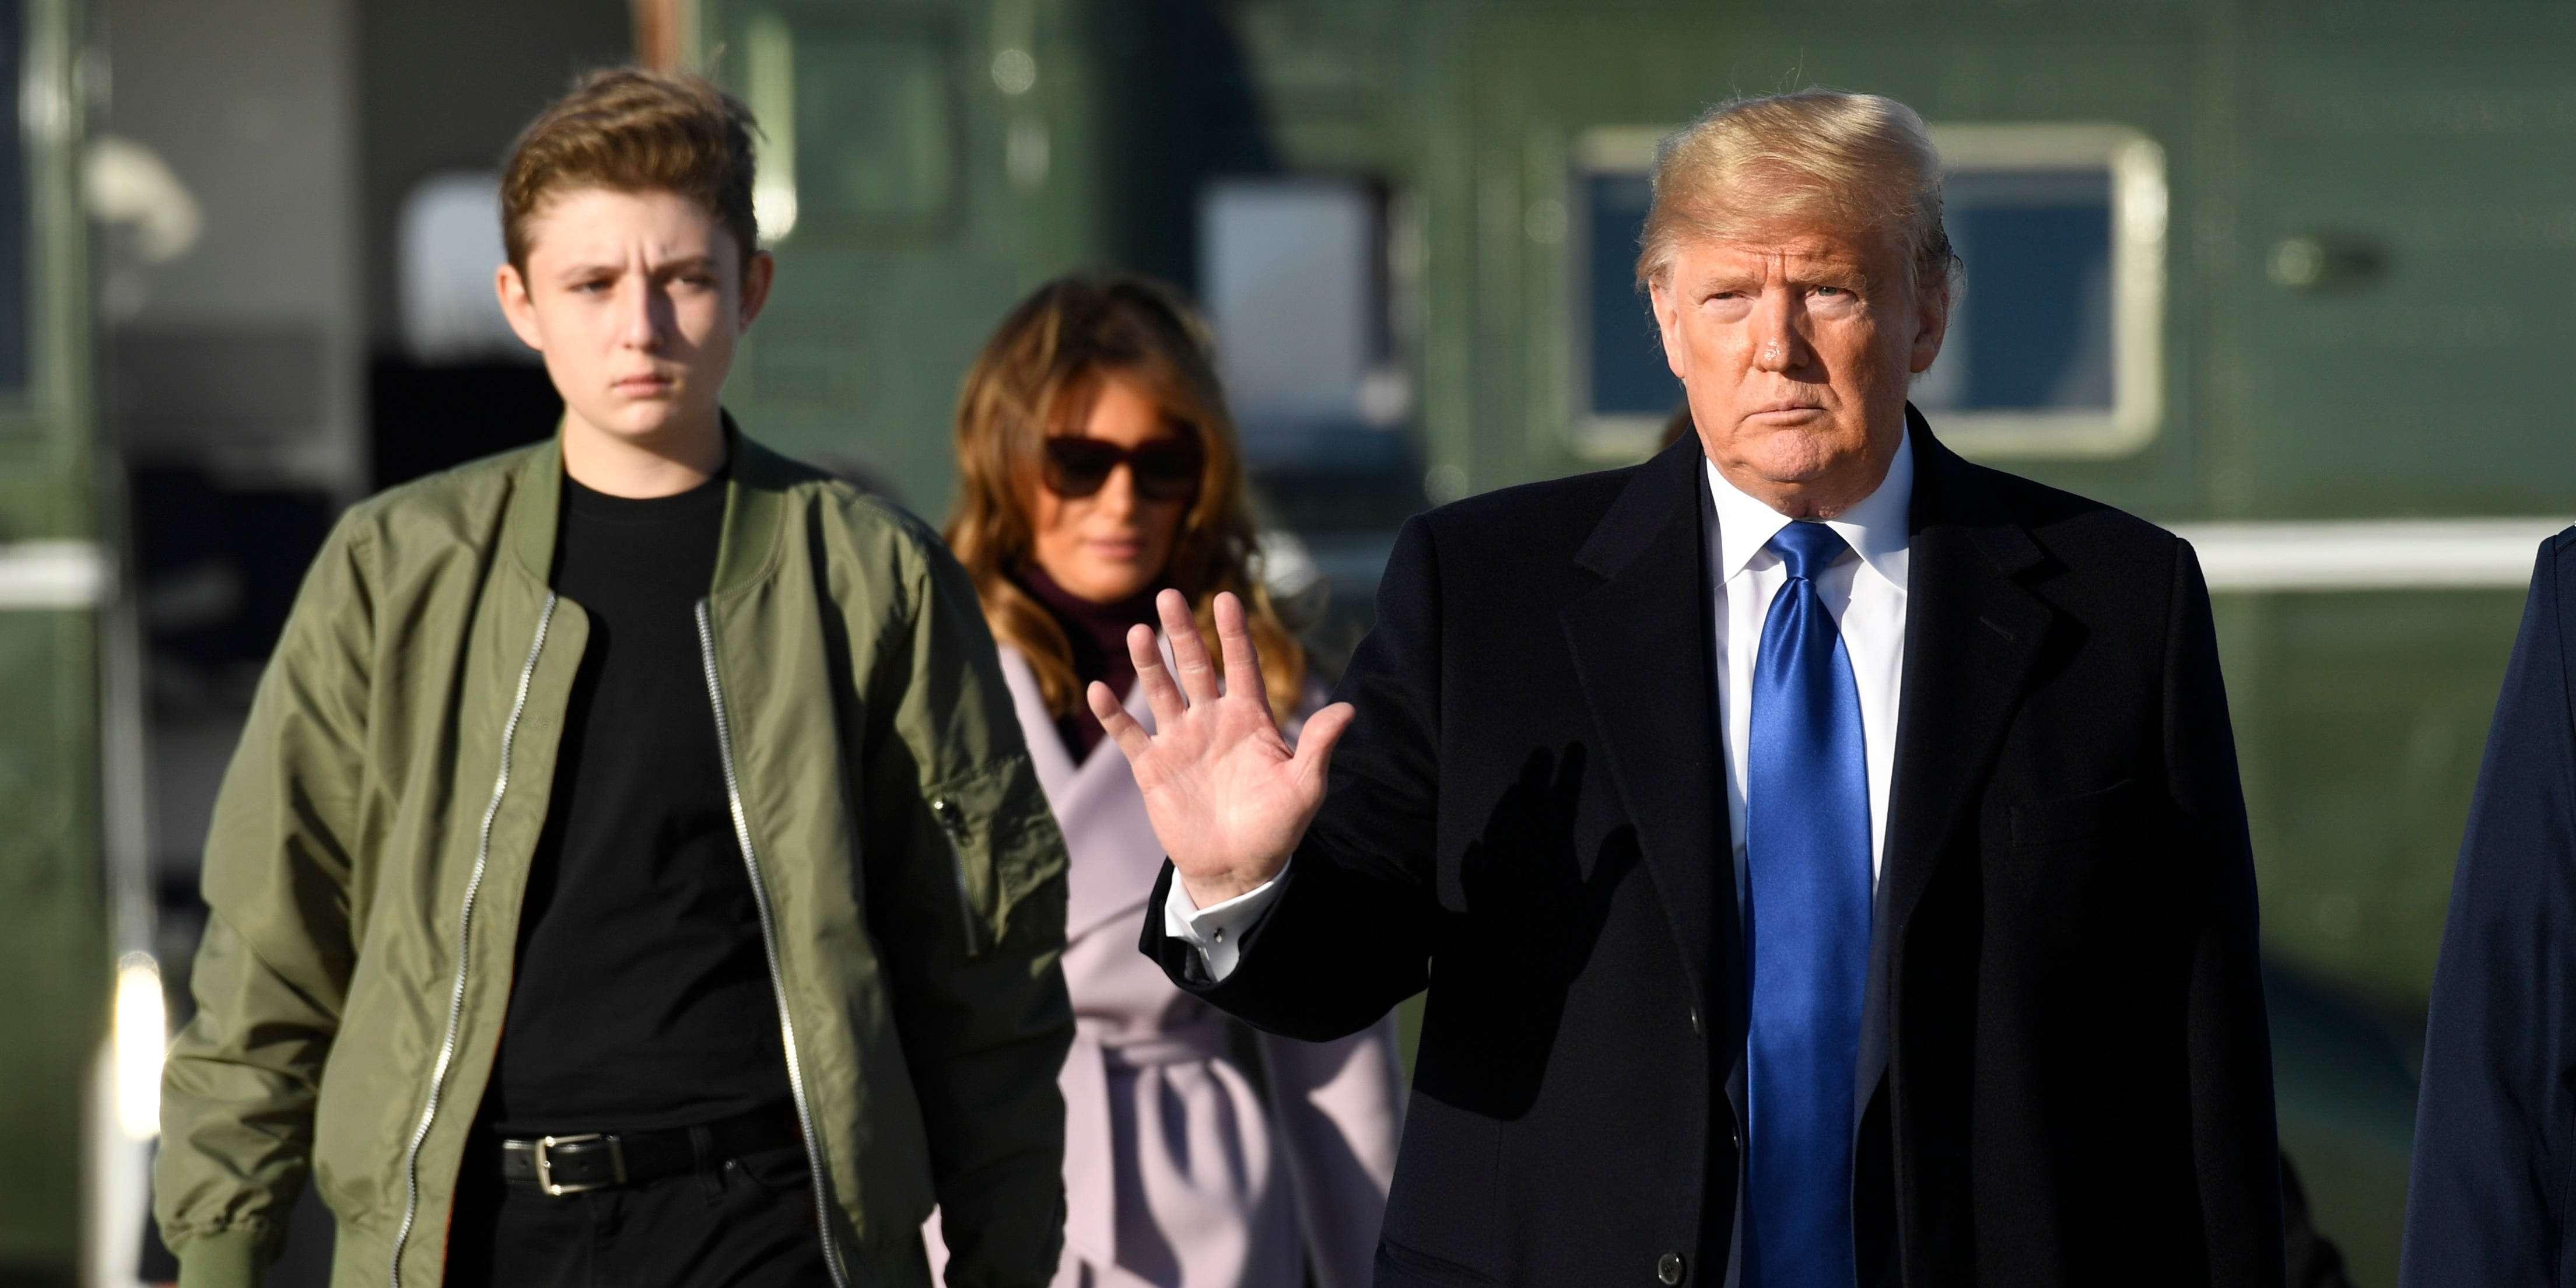 Barron Trump S School Won T Open For In Person Classes Business Insider